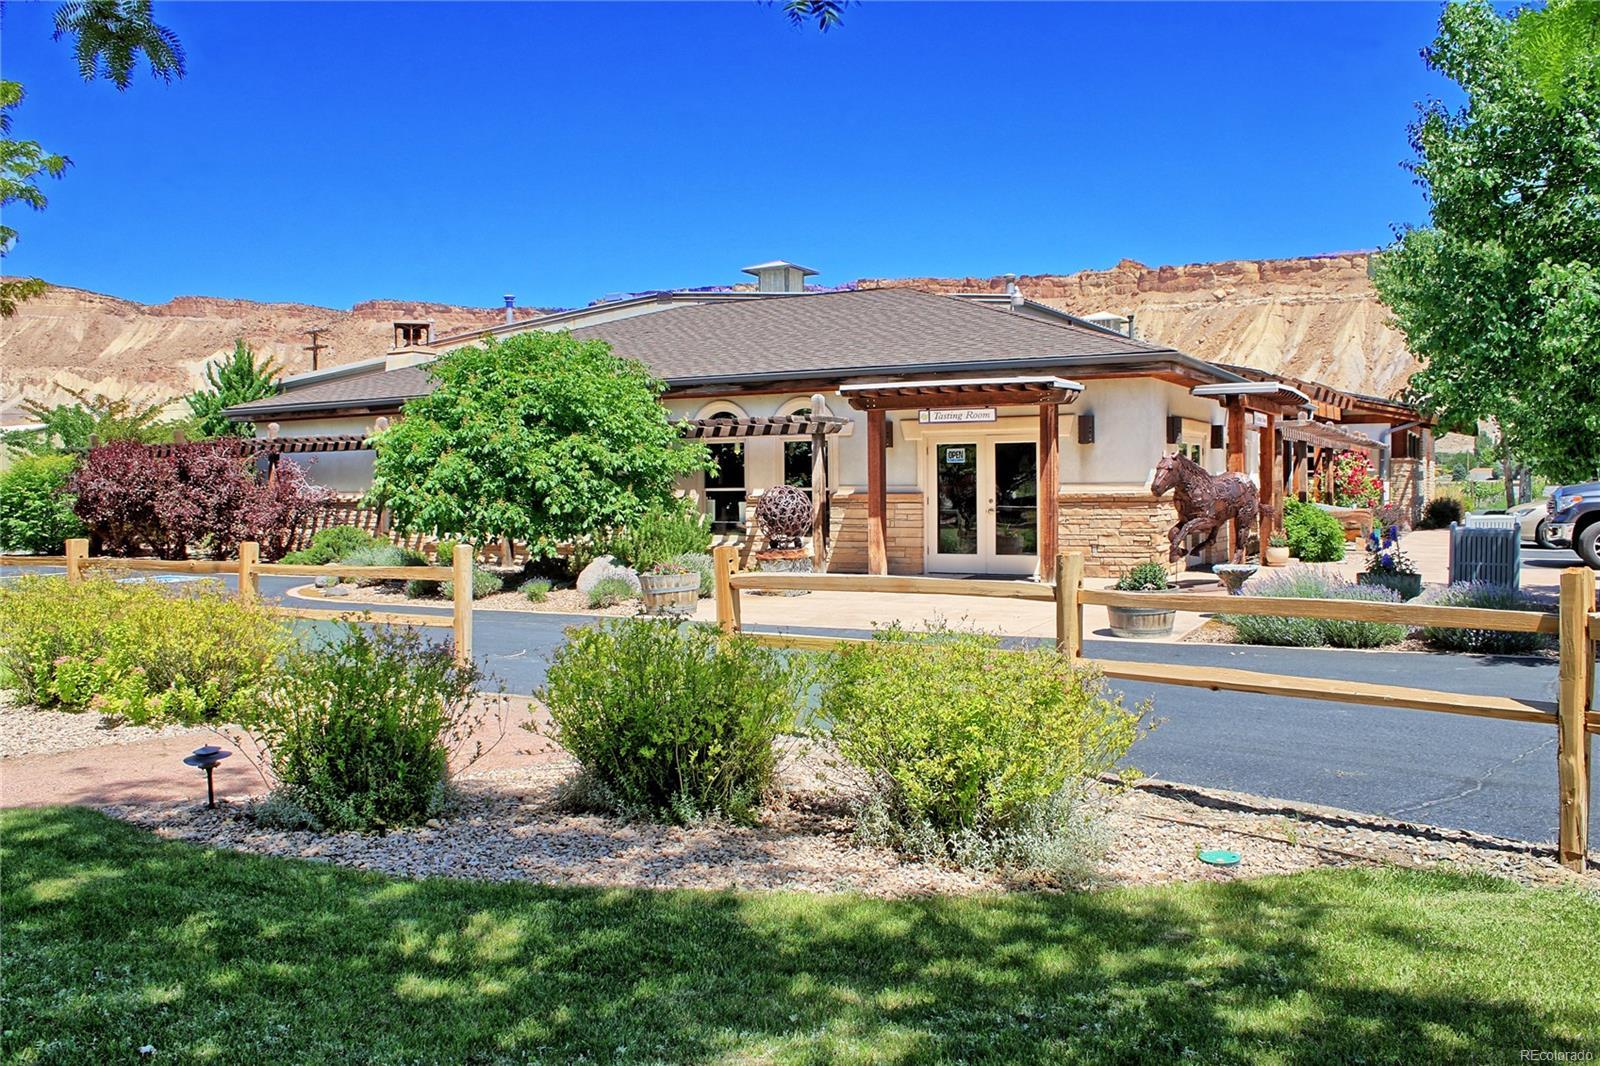 3708 G Road, Palisade, CO 81526 - Palisade, CO real estate listing